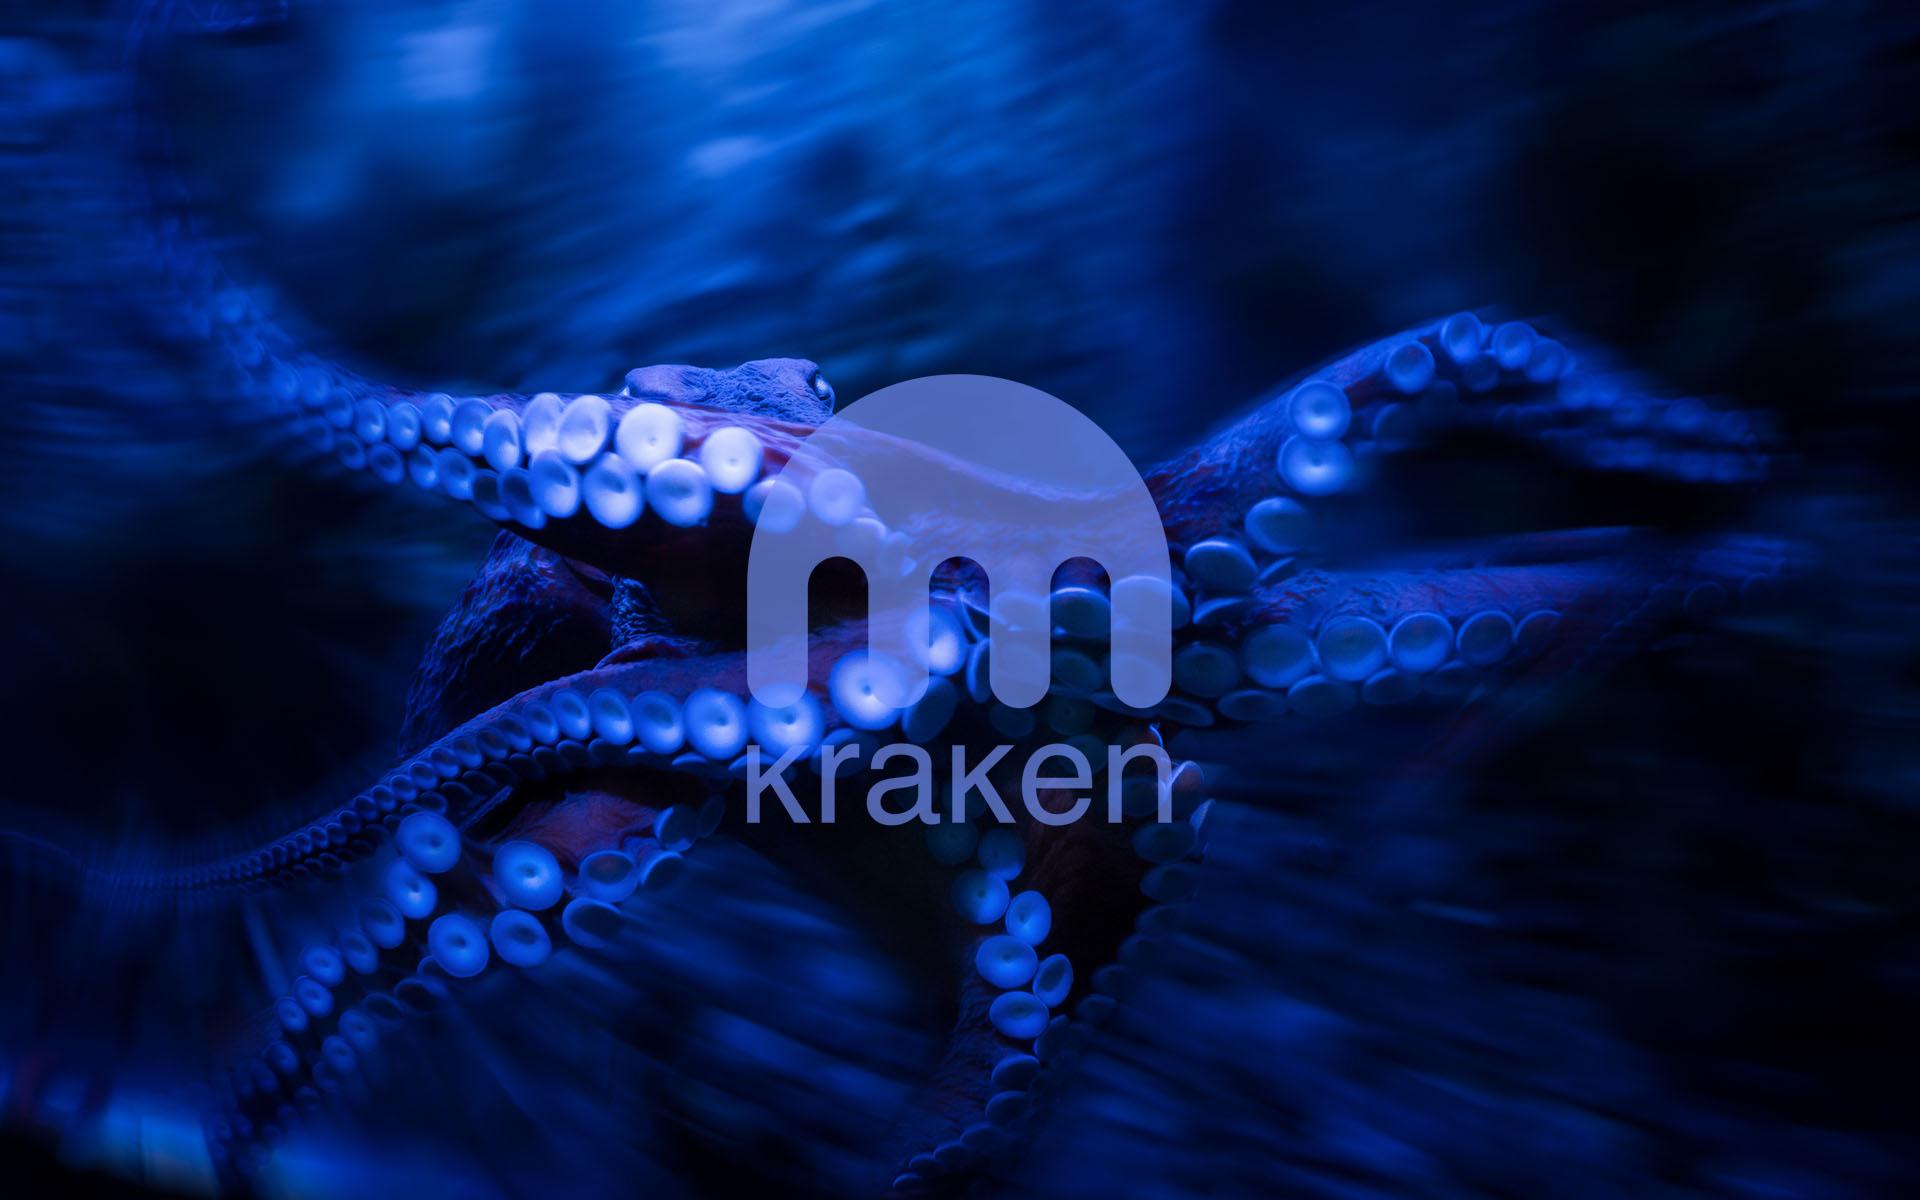 Kraken Reduces Fees Amidst Community Backlash